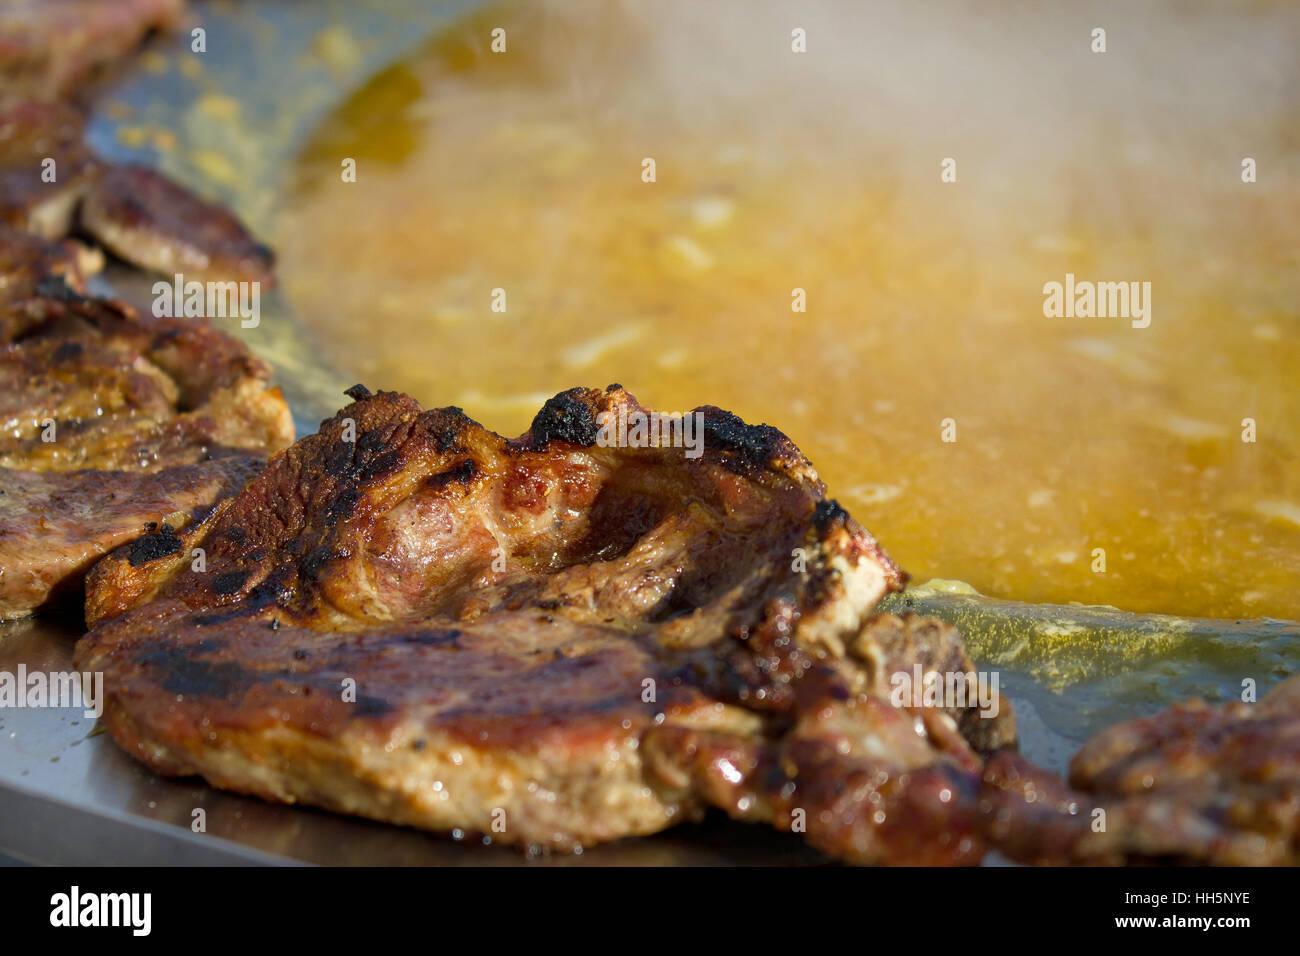 Steak grillé dans un plat croate kotlovina Photo Stock